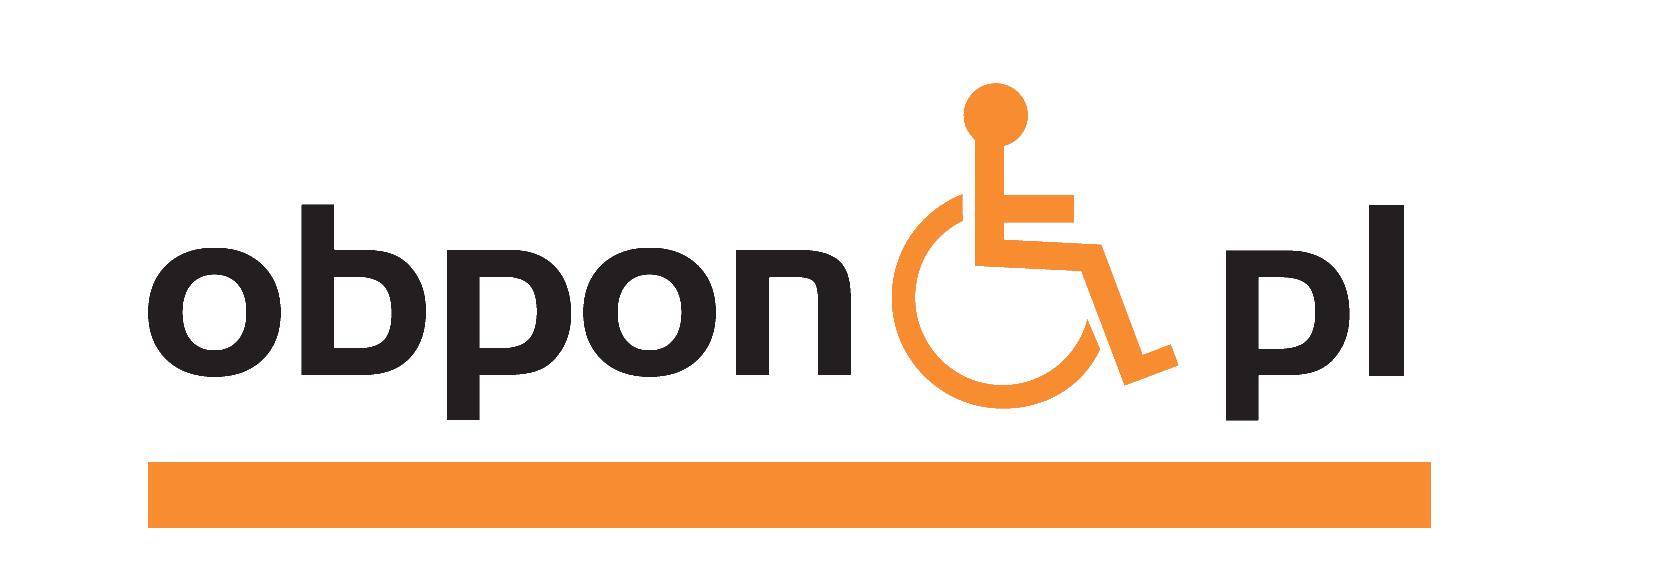 45 obpon-logo-802